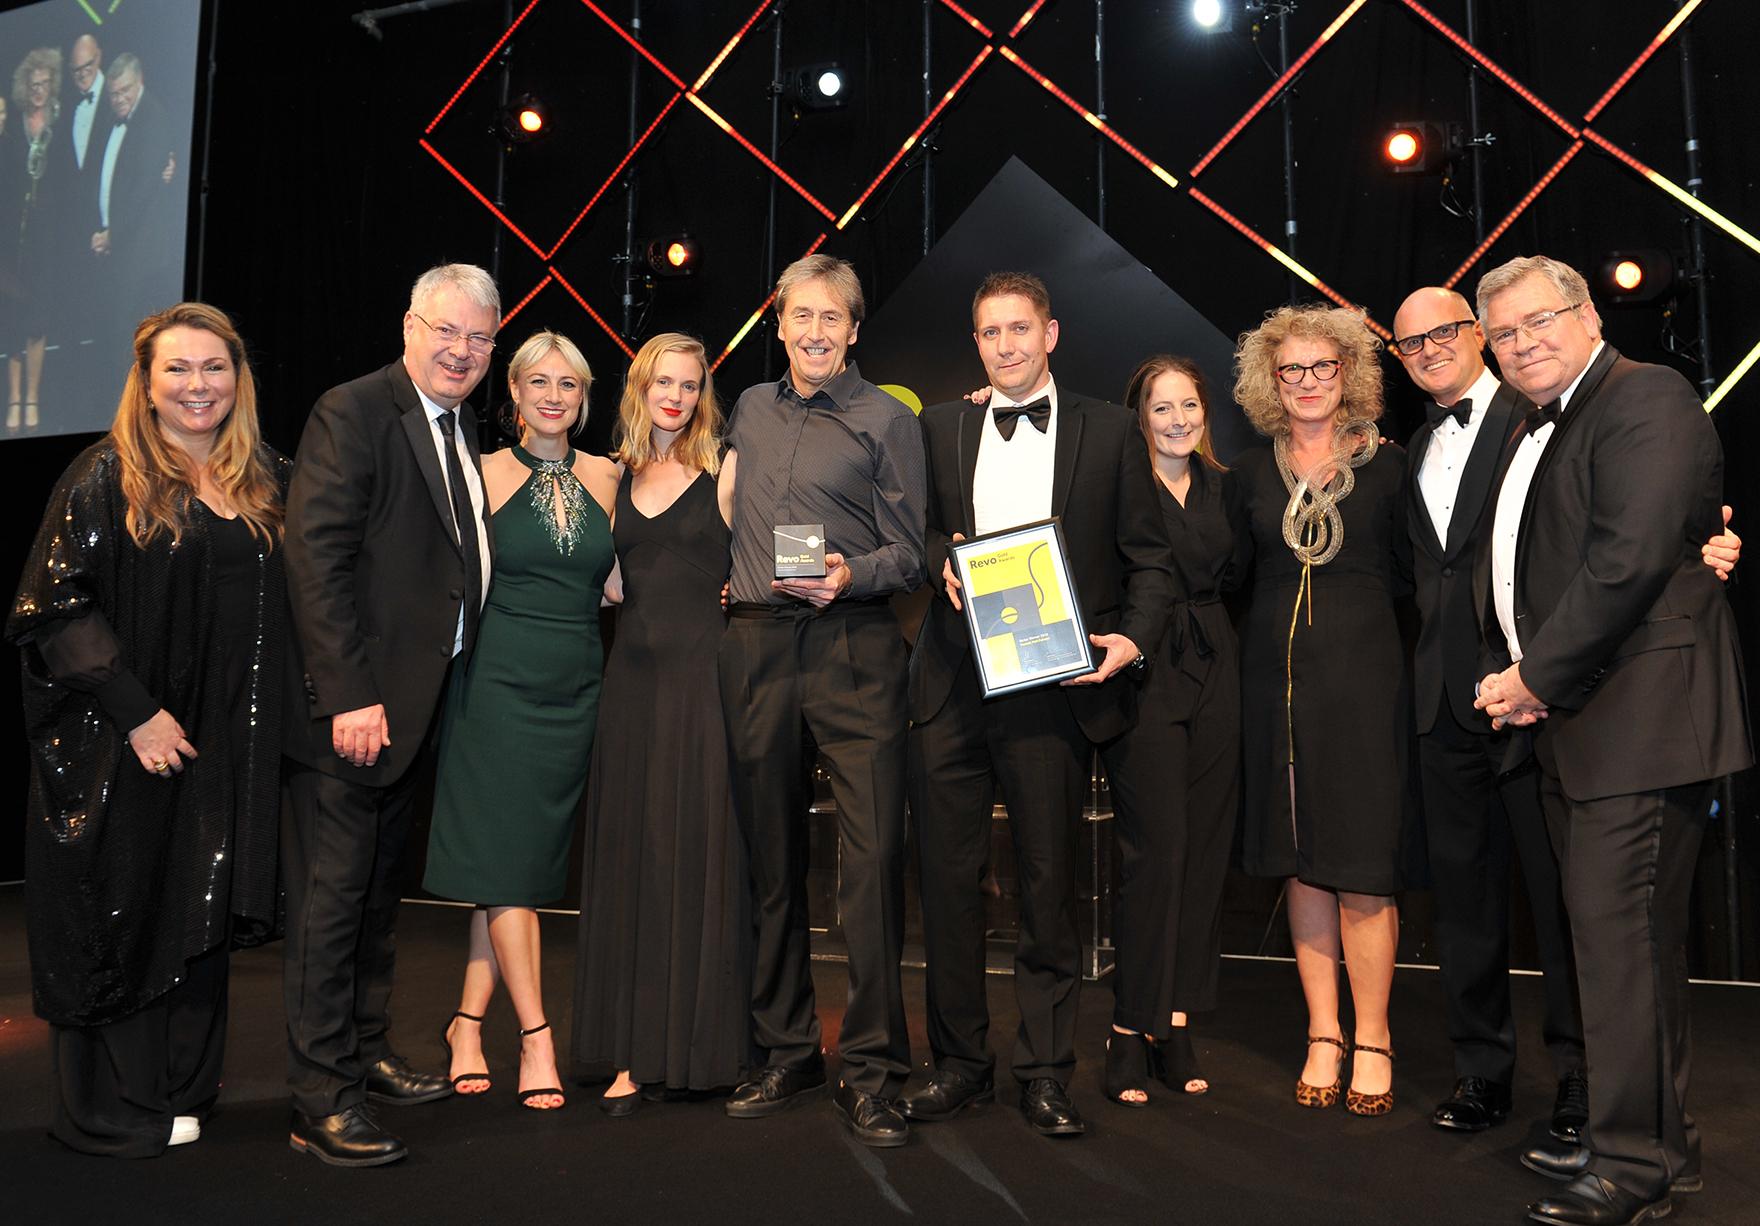 Market Hall Fulham Revo Gold Awards Best Of The Best Ii Lh